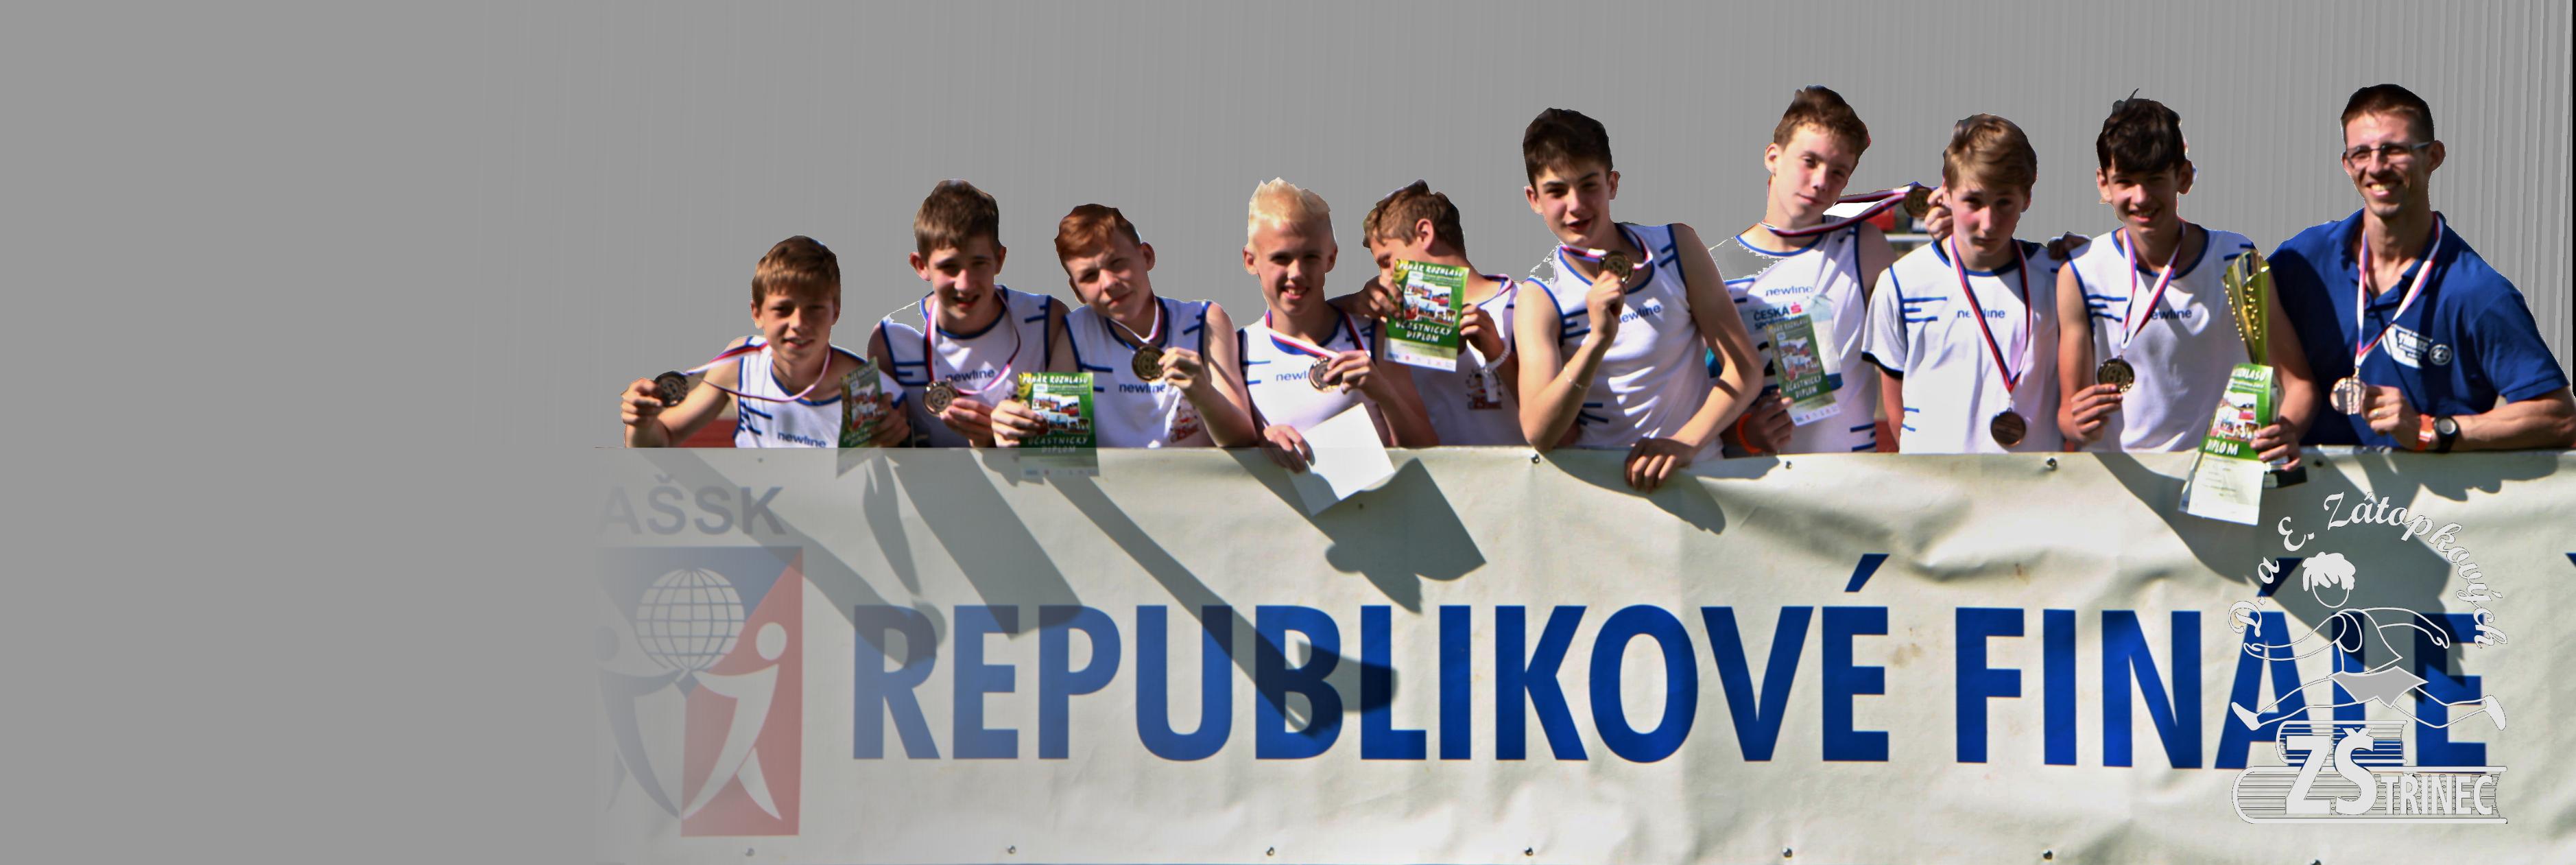 Atletika, republika 2015